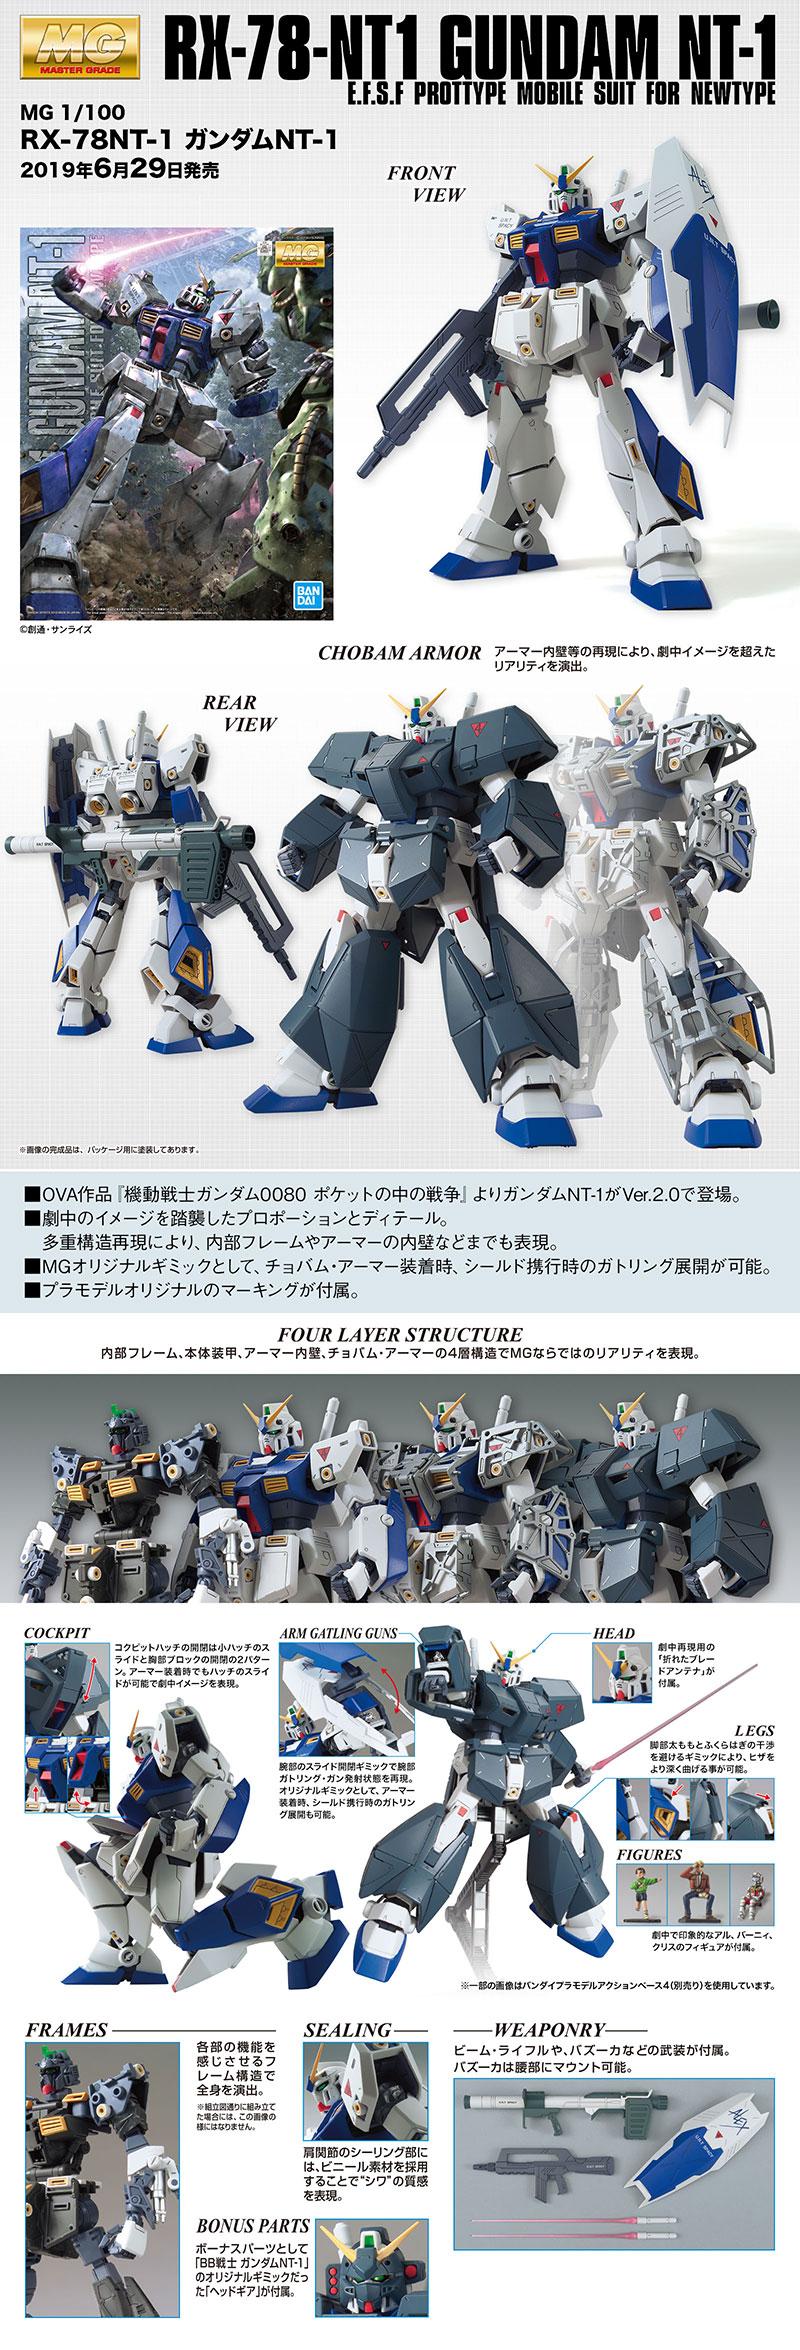 MG Gundam NT1 Alex Details